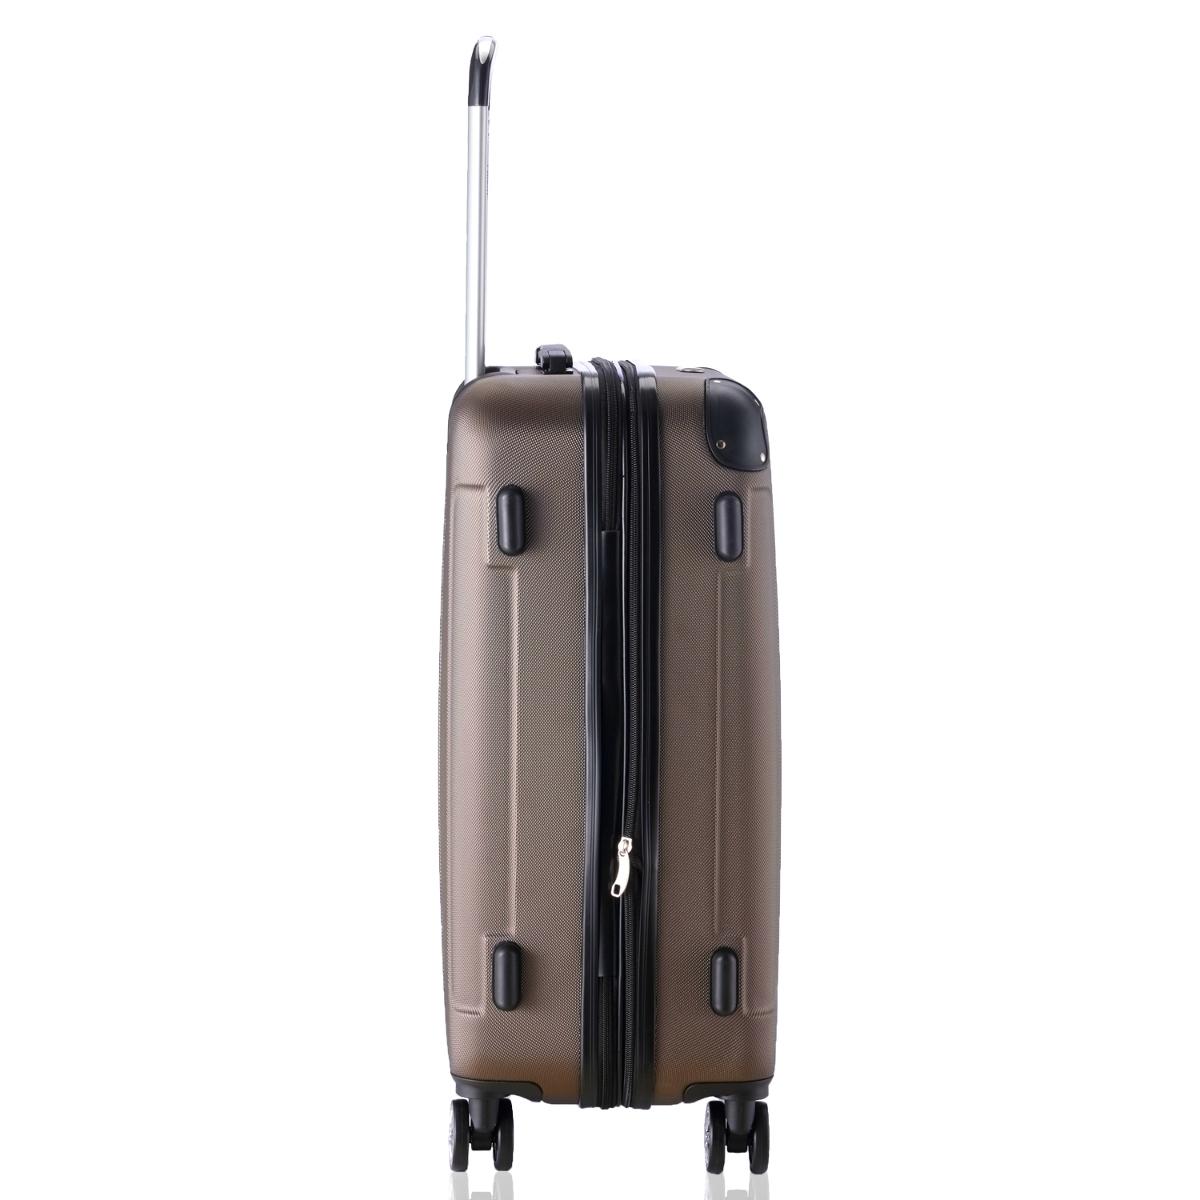 Koffer-Flexot-2045-Hartschalenkoffer-Trolley-Kofferset-Reisekoffer-M-L-XL-Set Indexbild 60